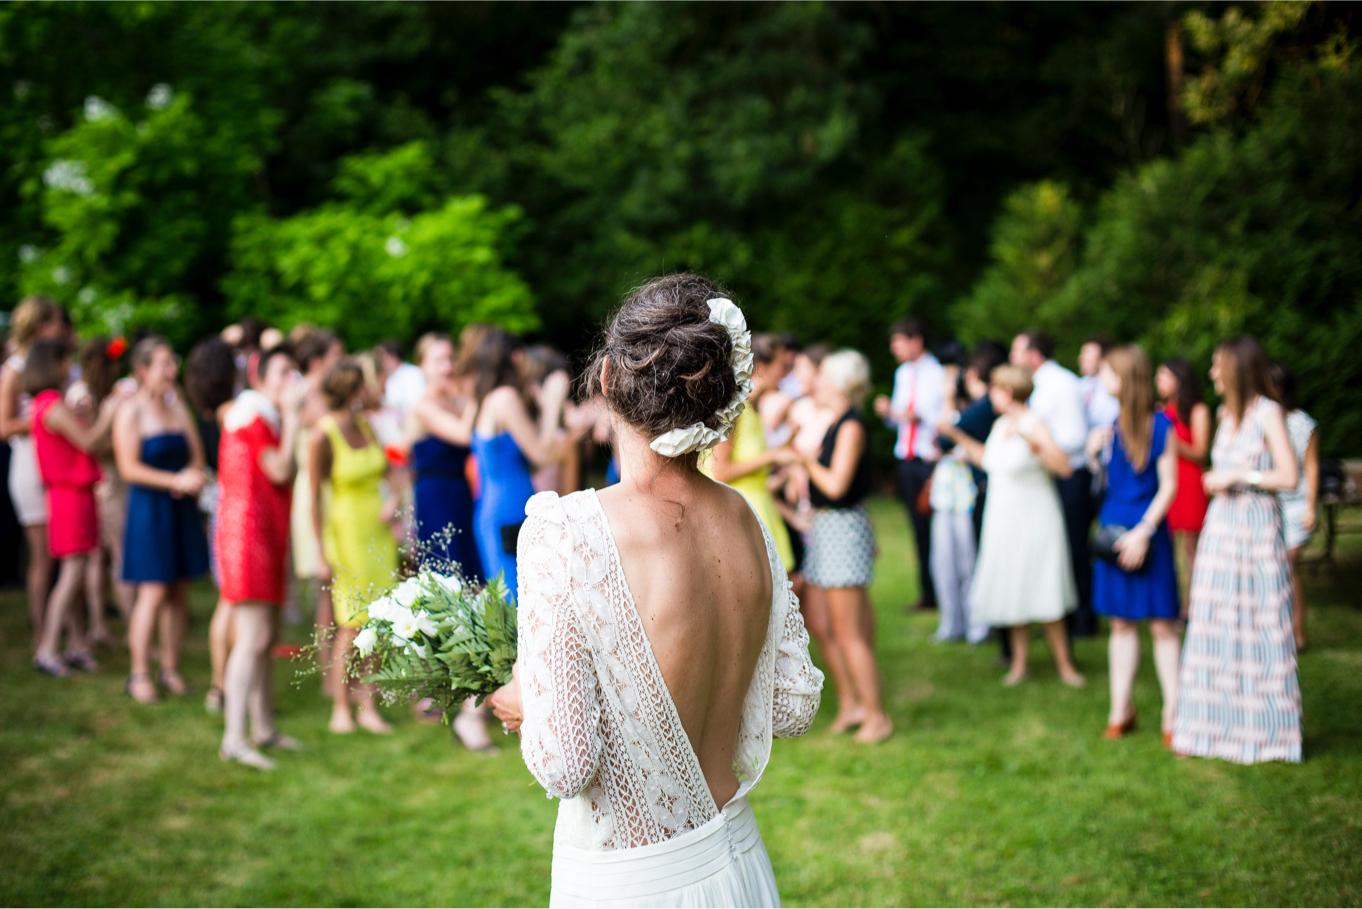 ¡Organiza tu boda sin arruinarte!